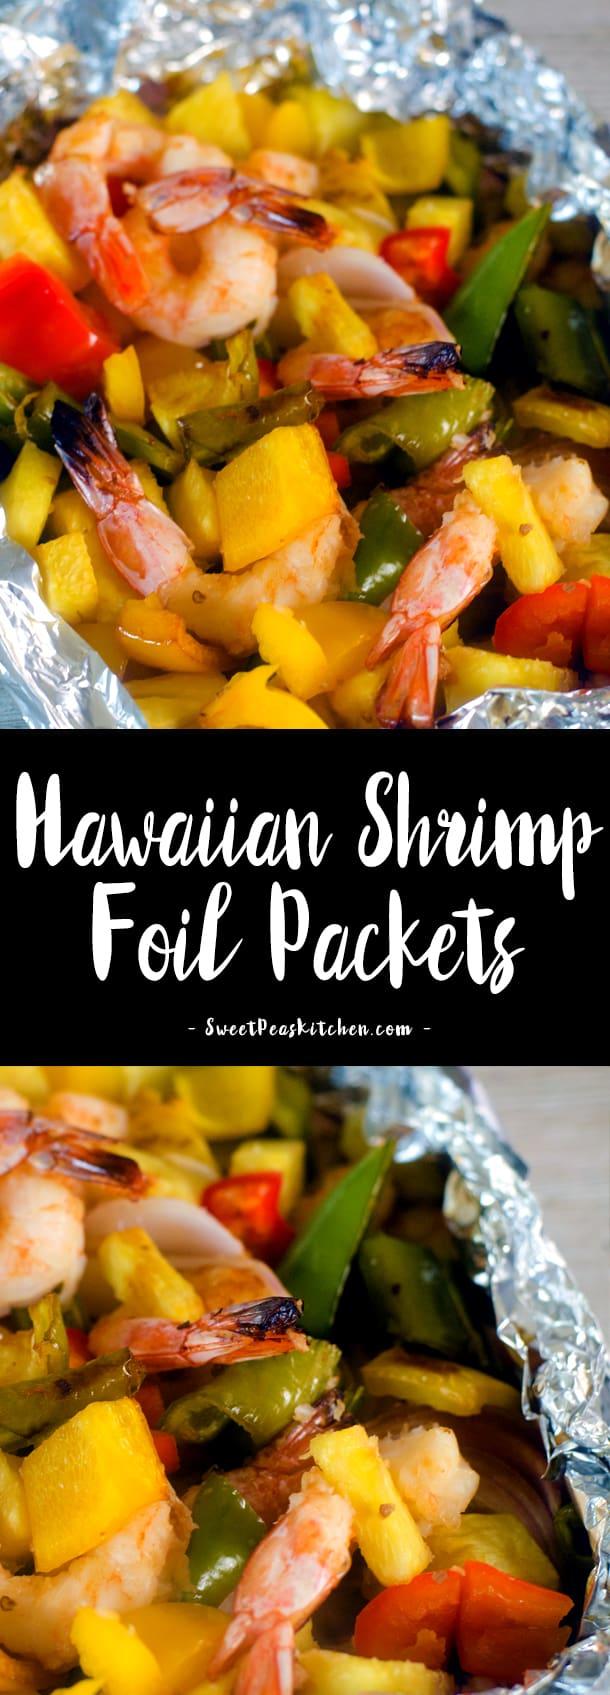 Hawaiian Shrimp Foil Packets